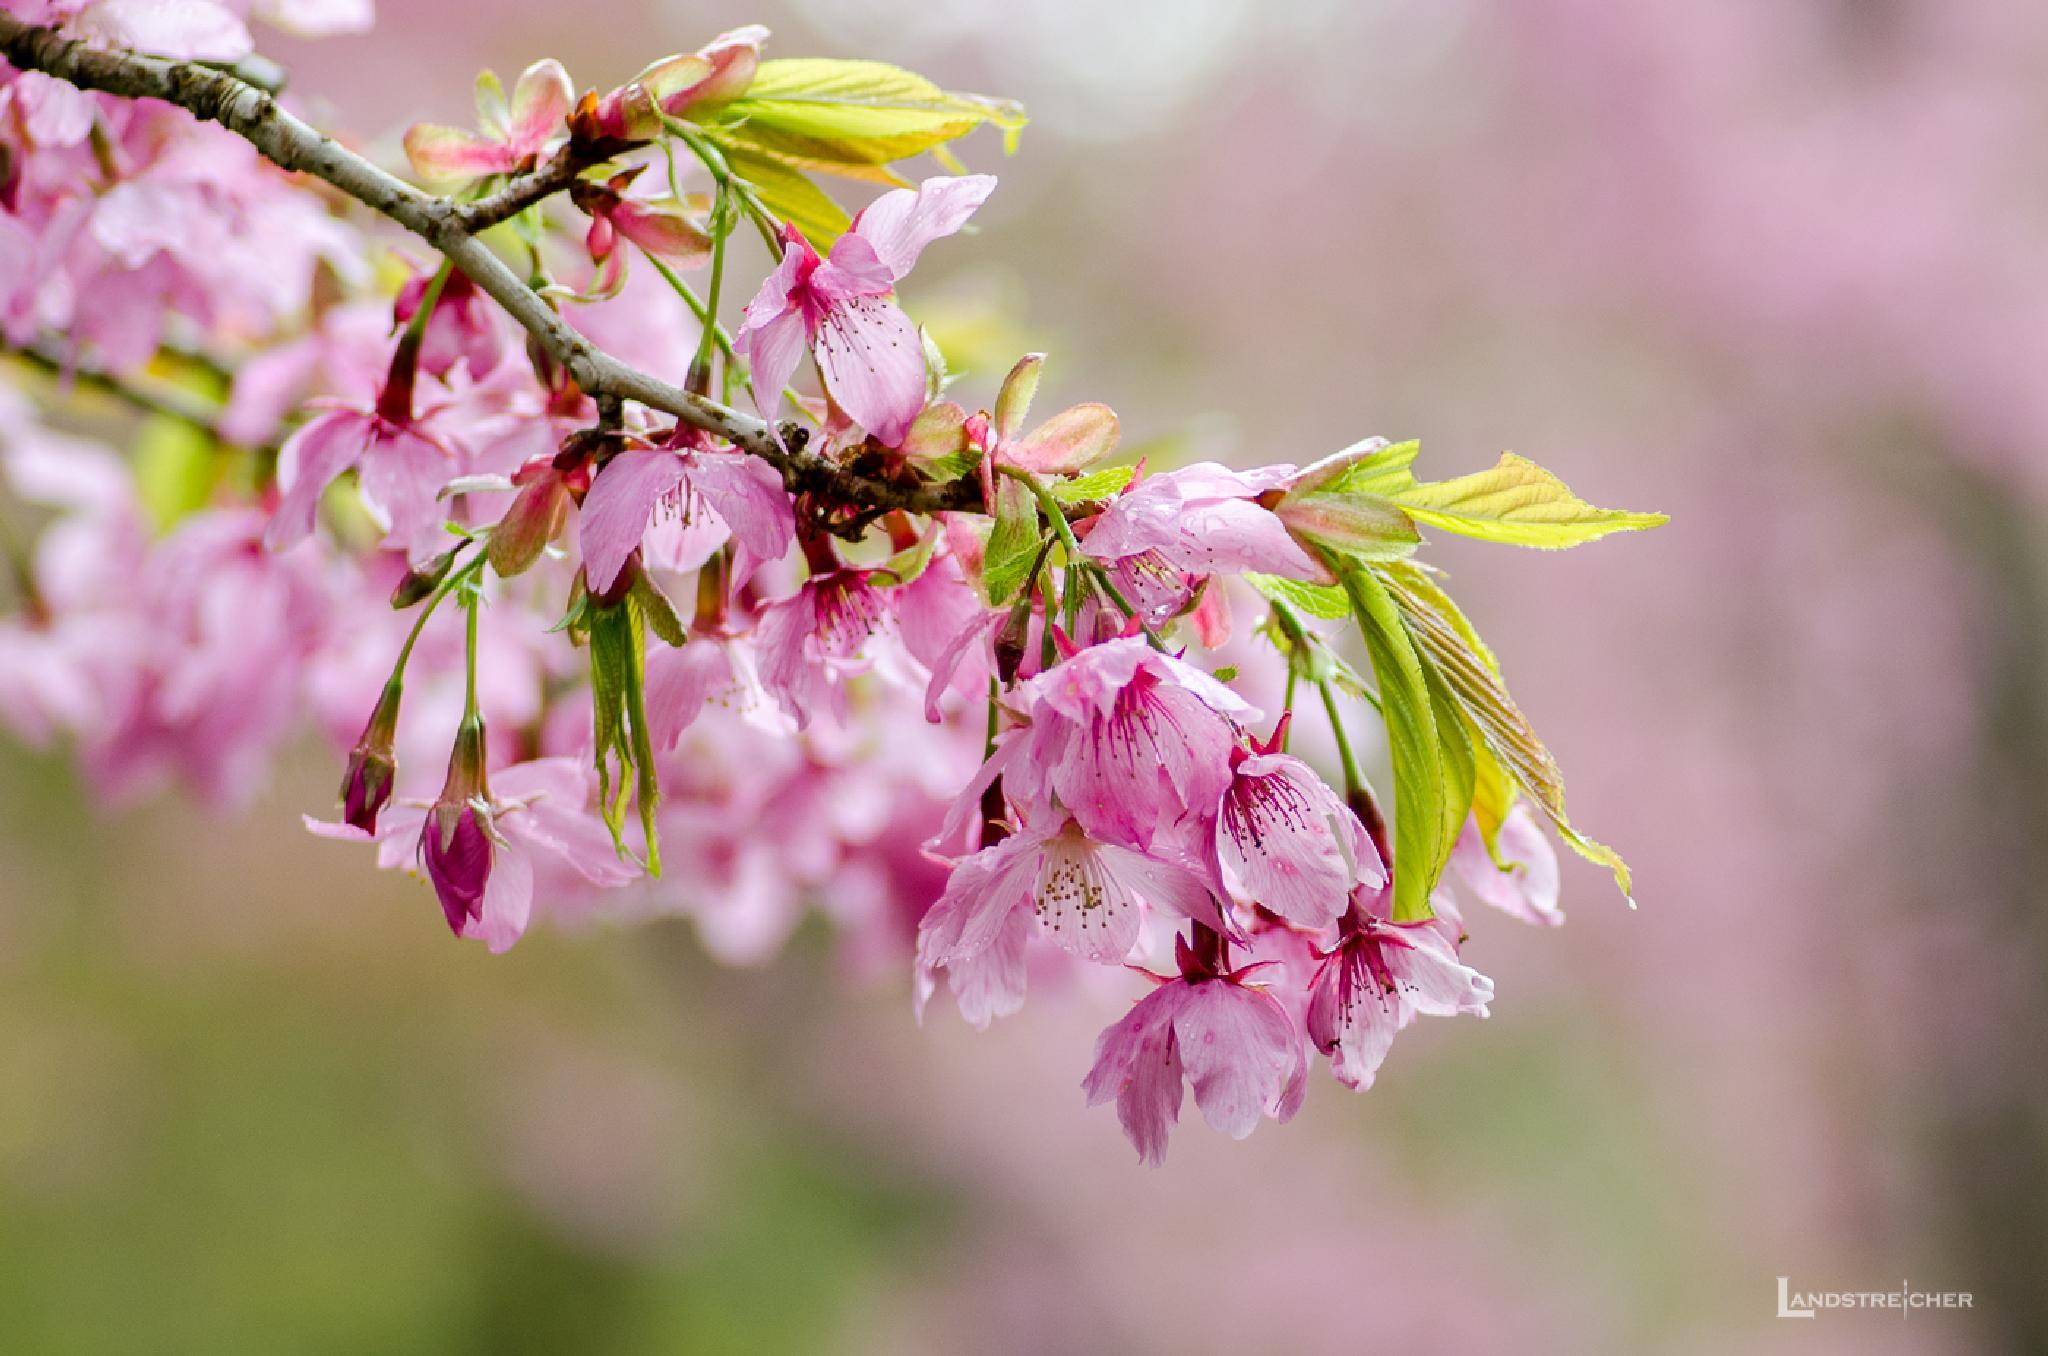 Cherry Blossom in Alishan, Taiwan by Landstreicher